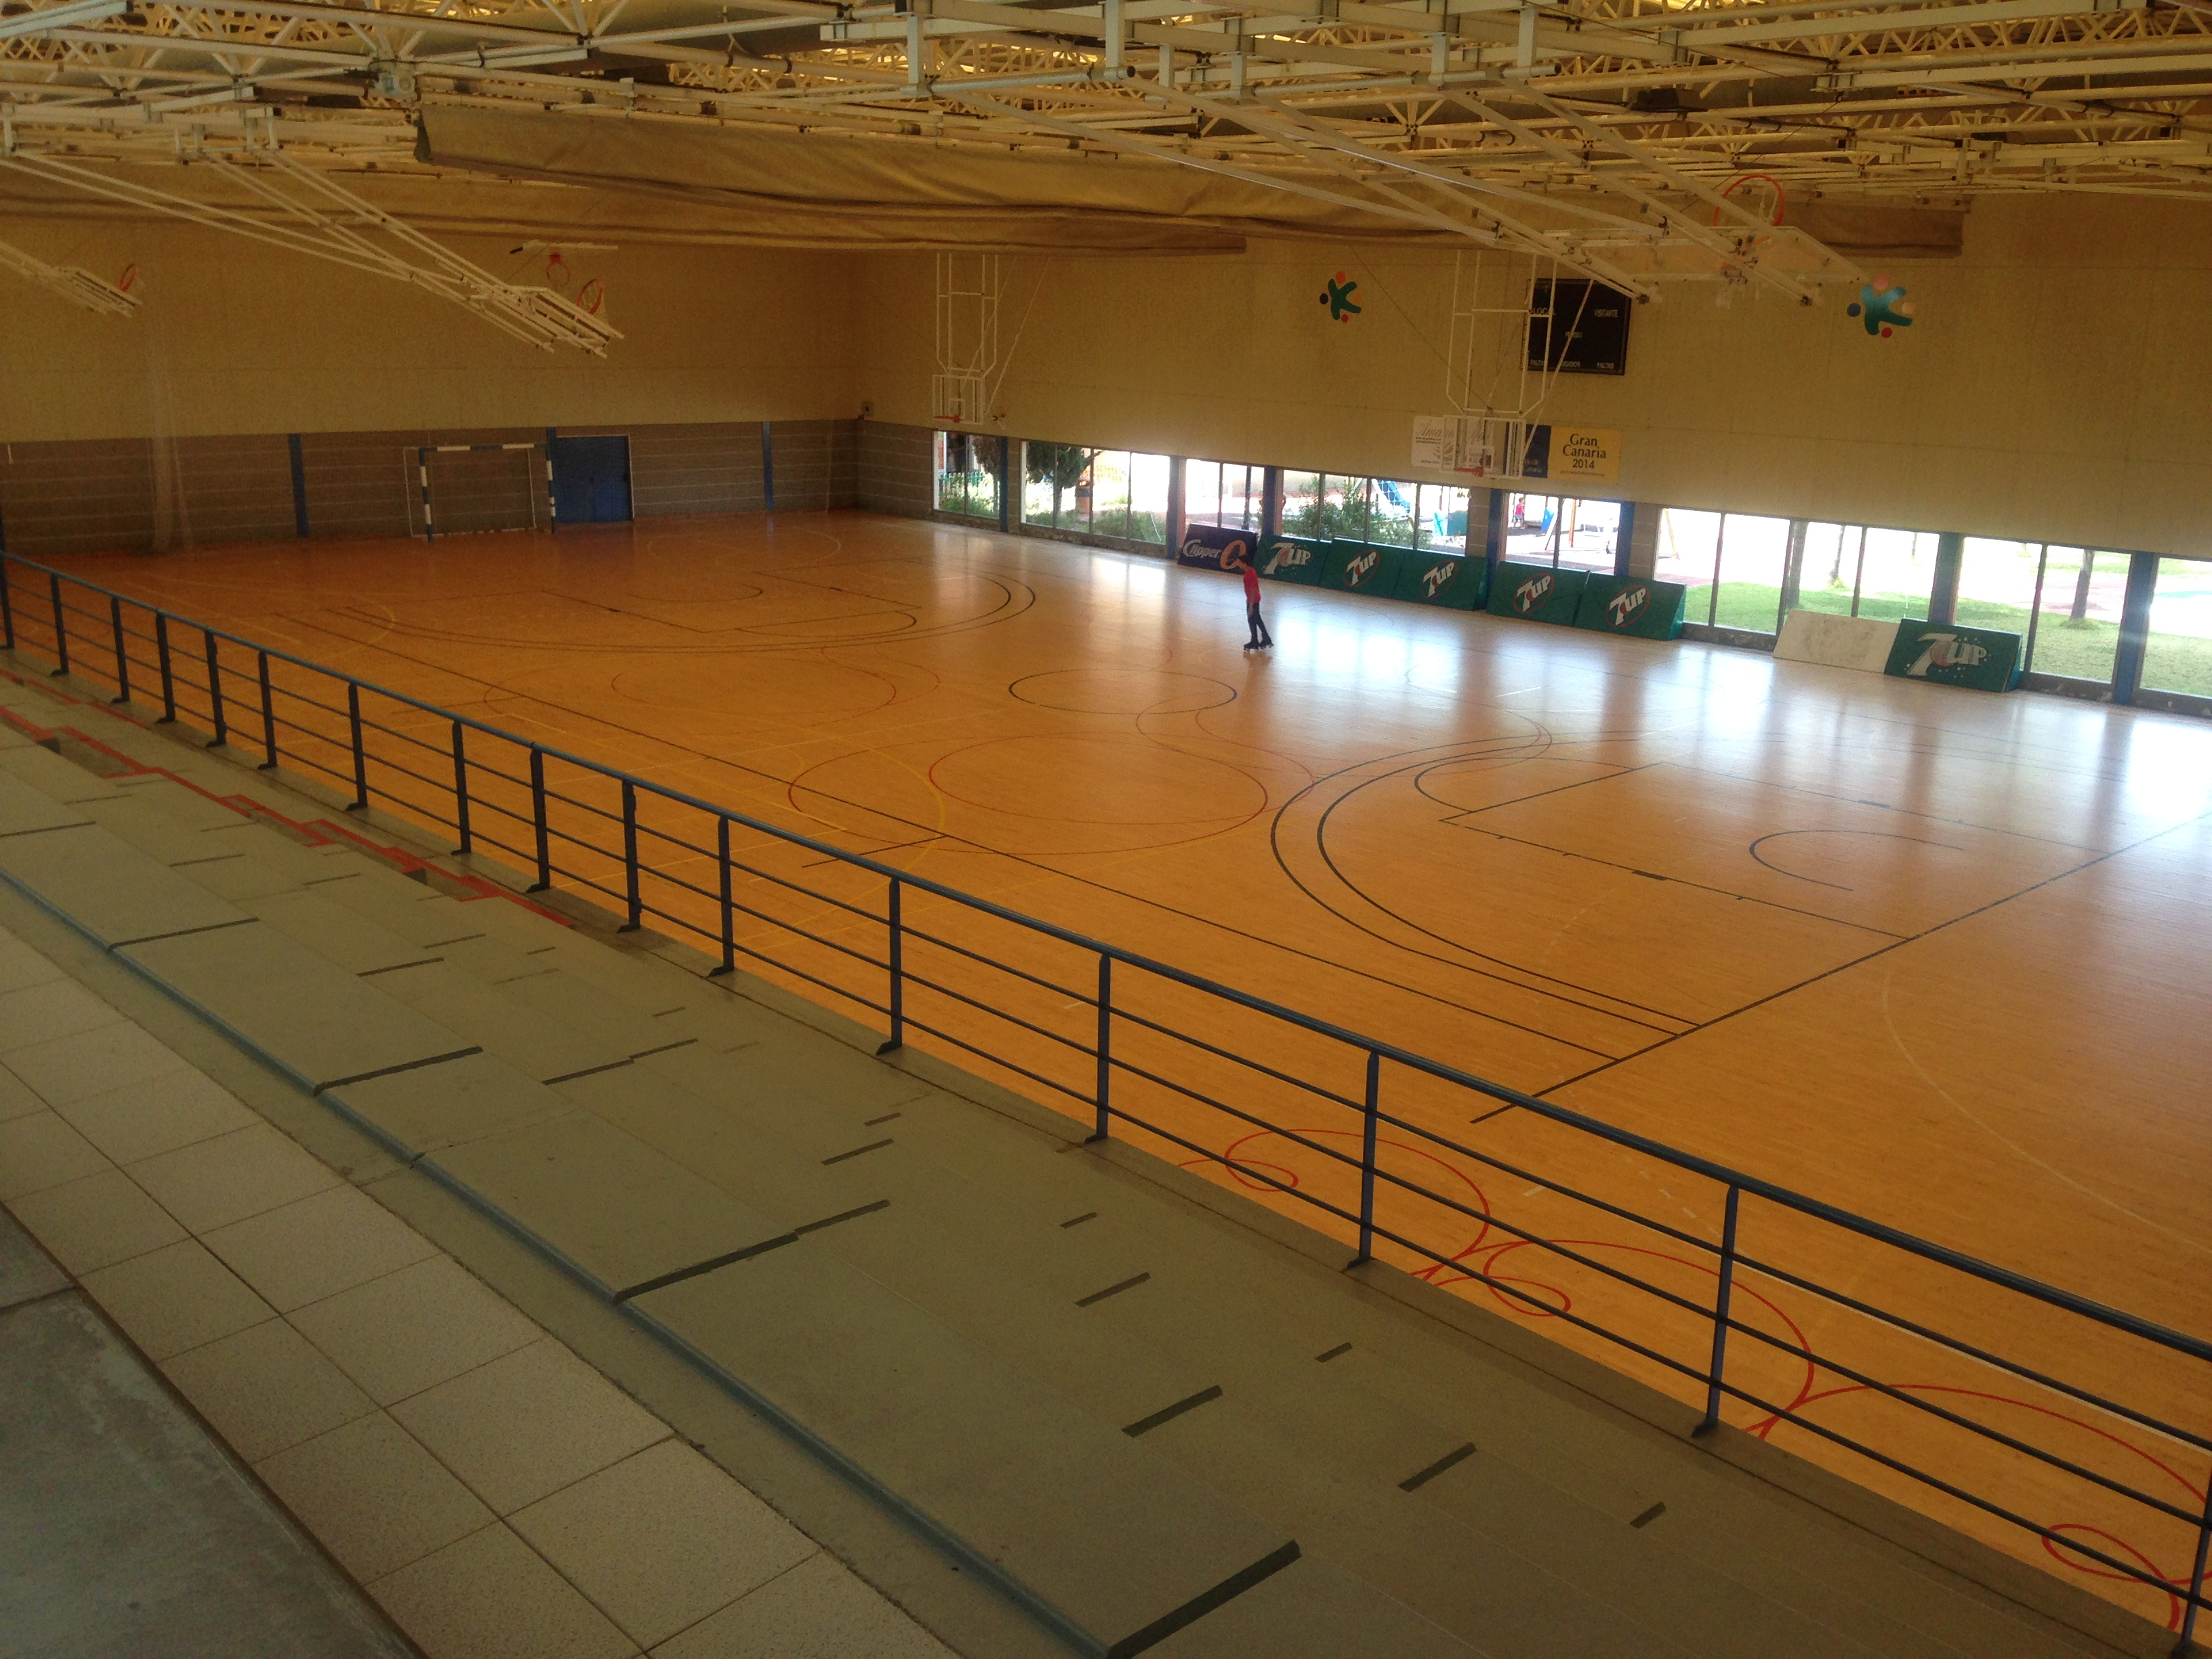 Polideportivo de Santa Brígida